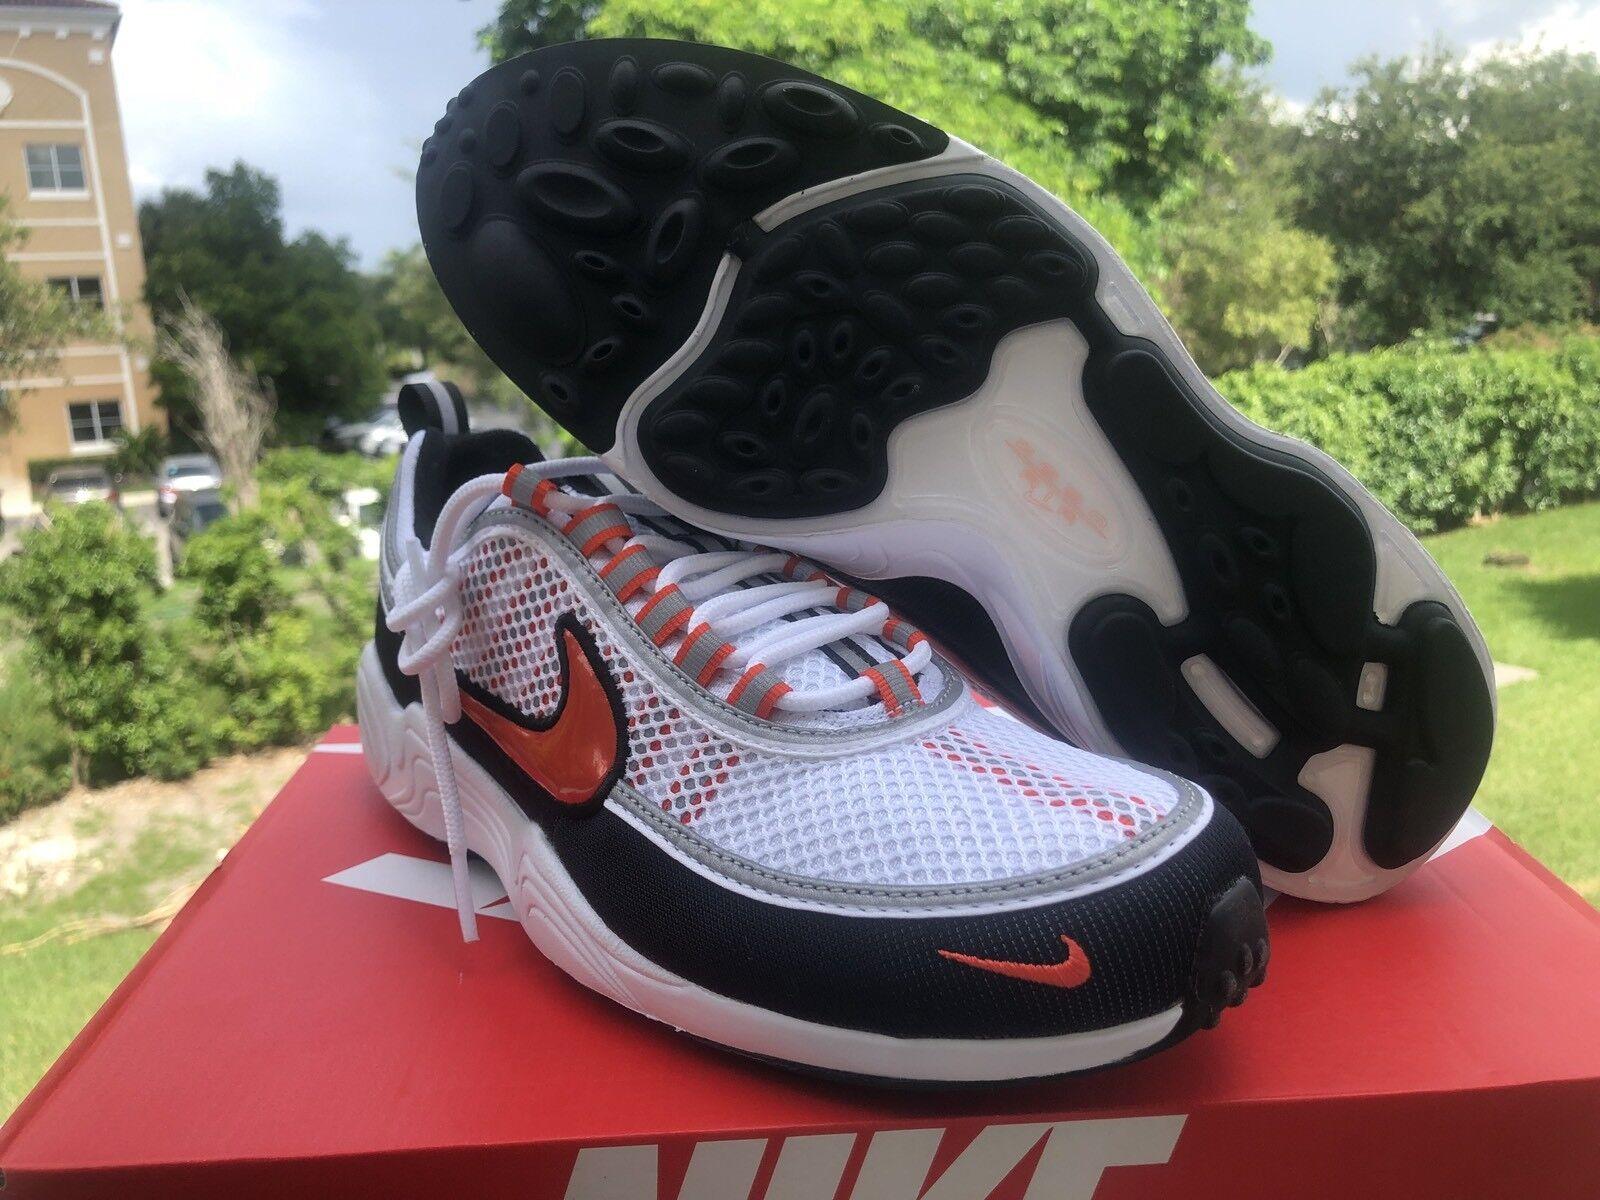 best-selling model of the brand Nike Air Zoom Spiridon '16 White Team Orange Black Comfortable